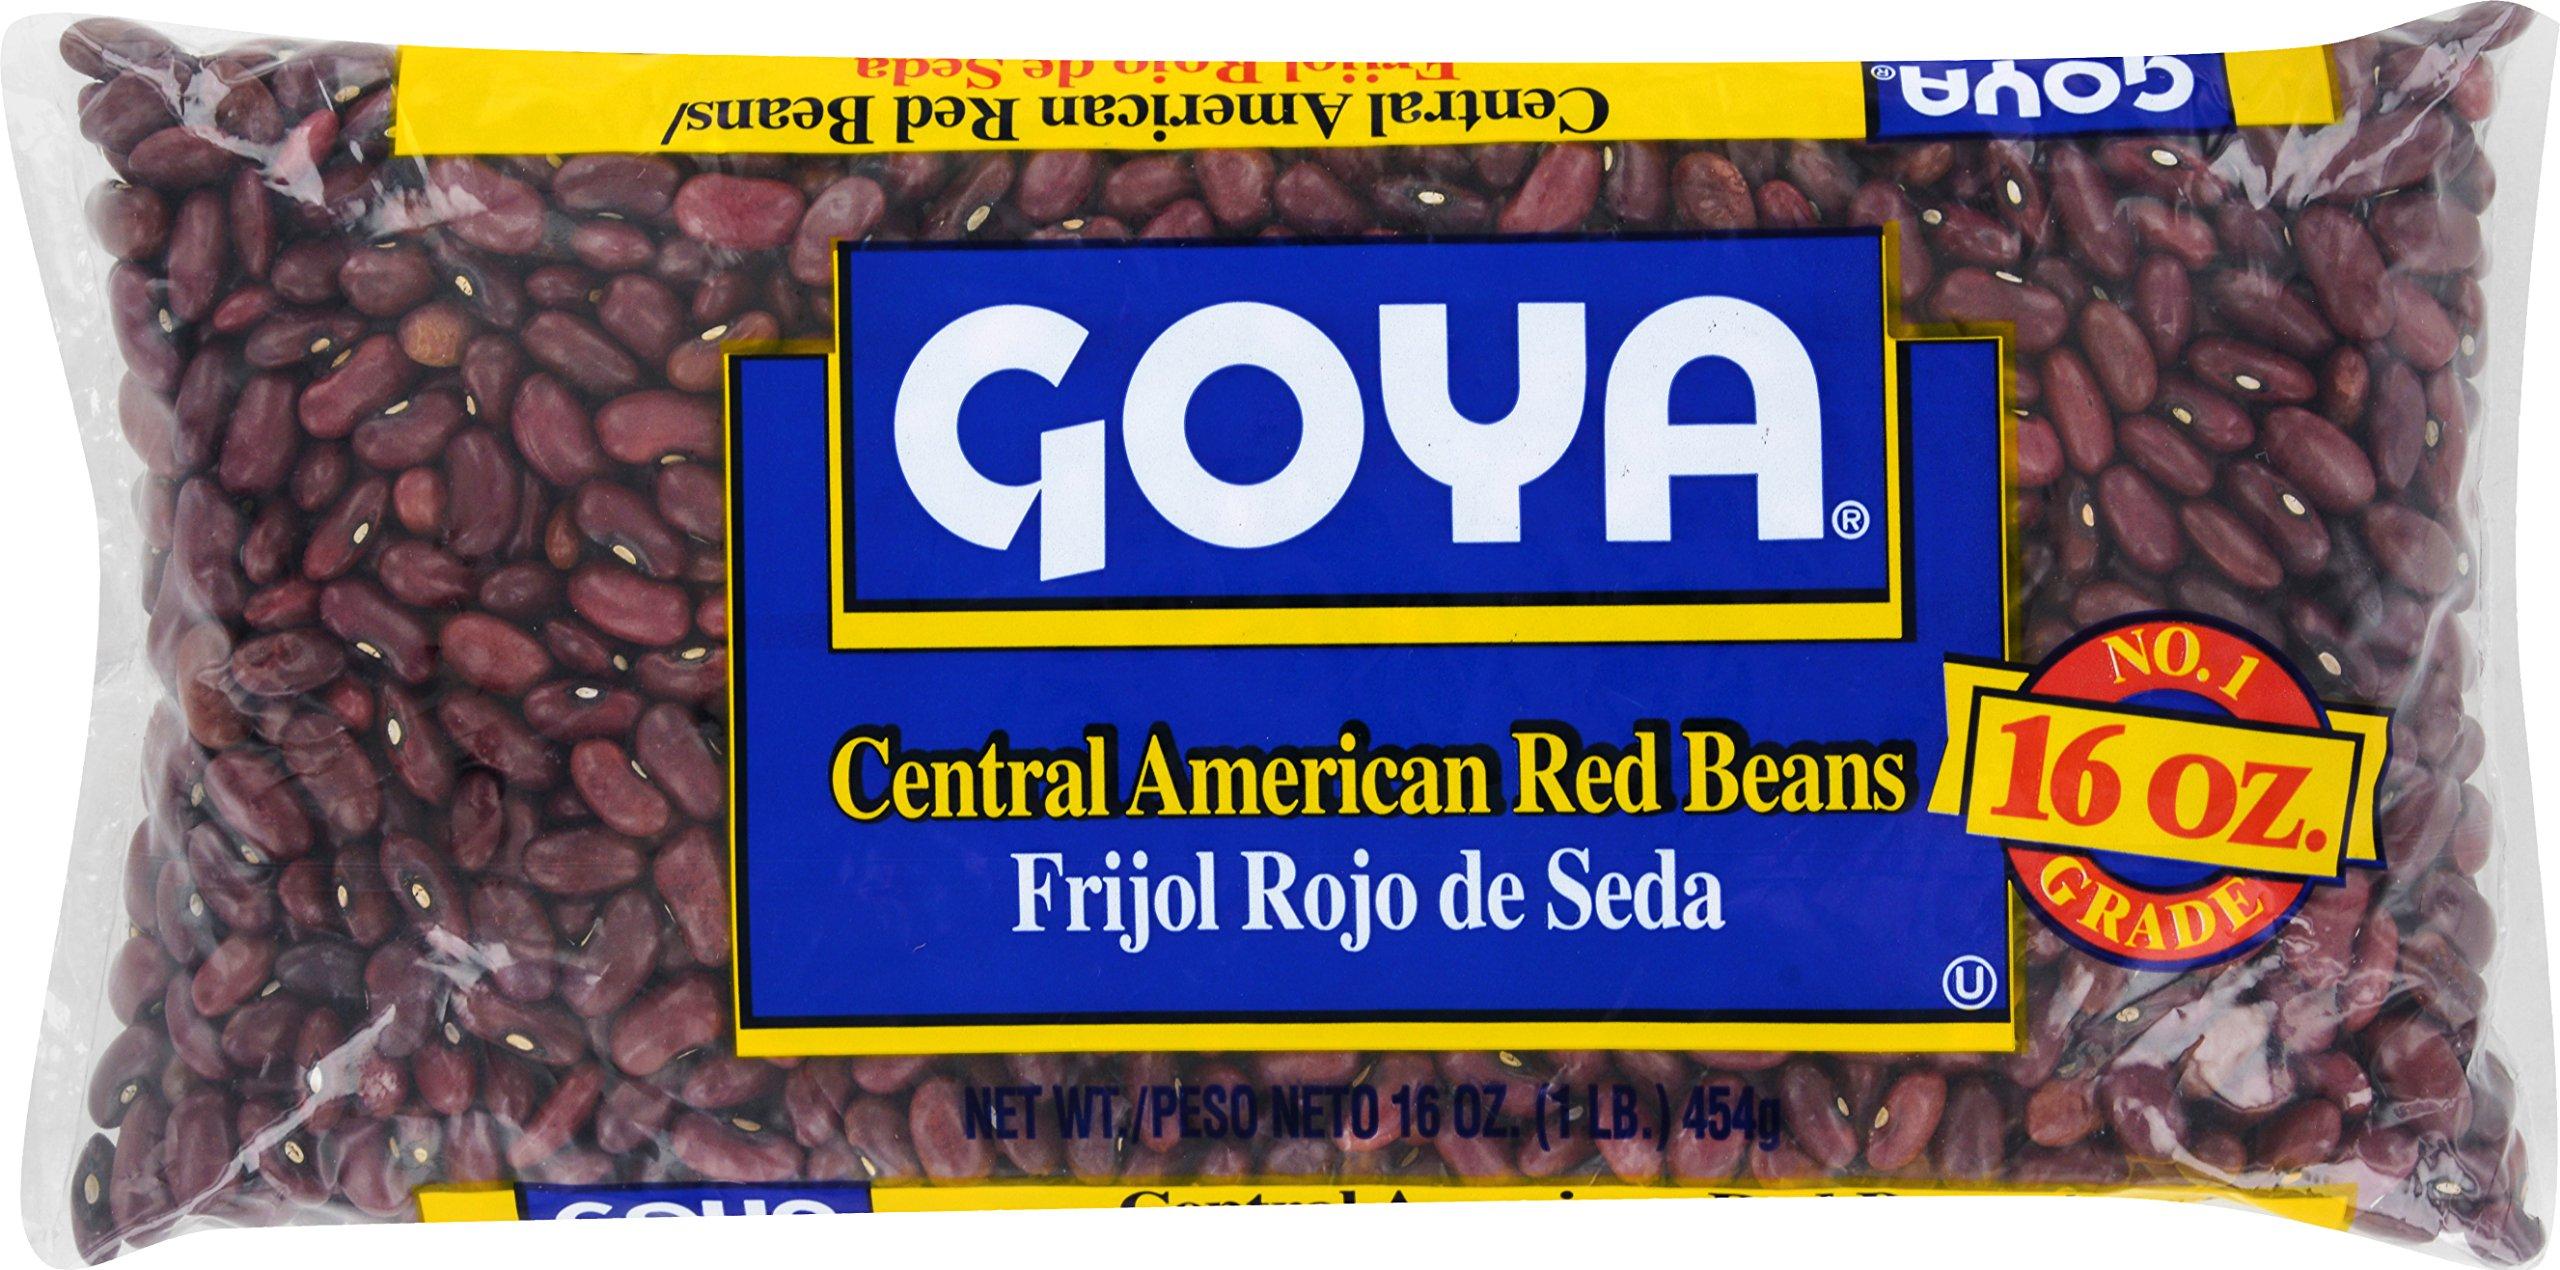 Goya Foods Salvadorean Red Beans (Frijol Rojo De Seda), 16-Ounce (Pack of 24) by Goya